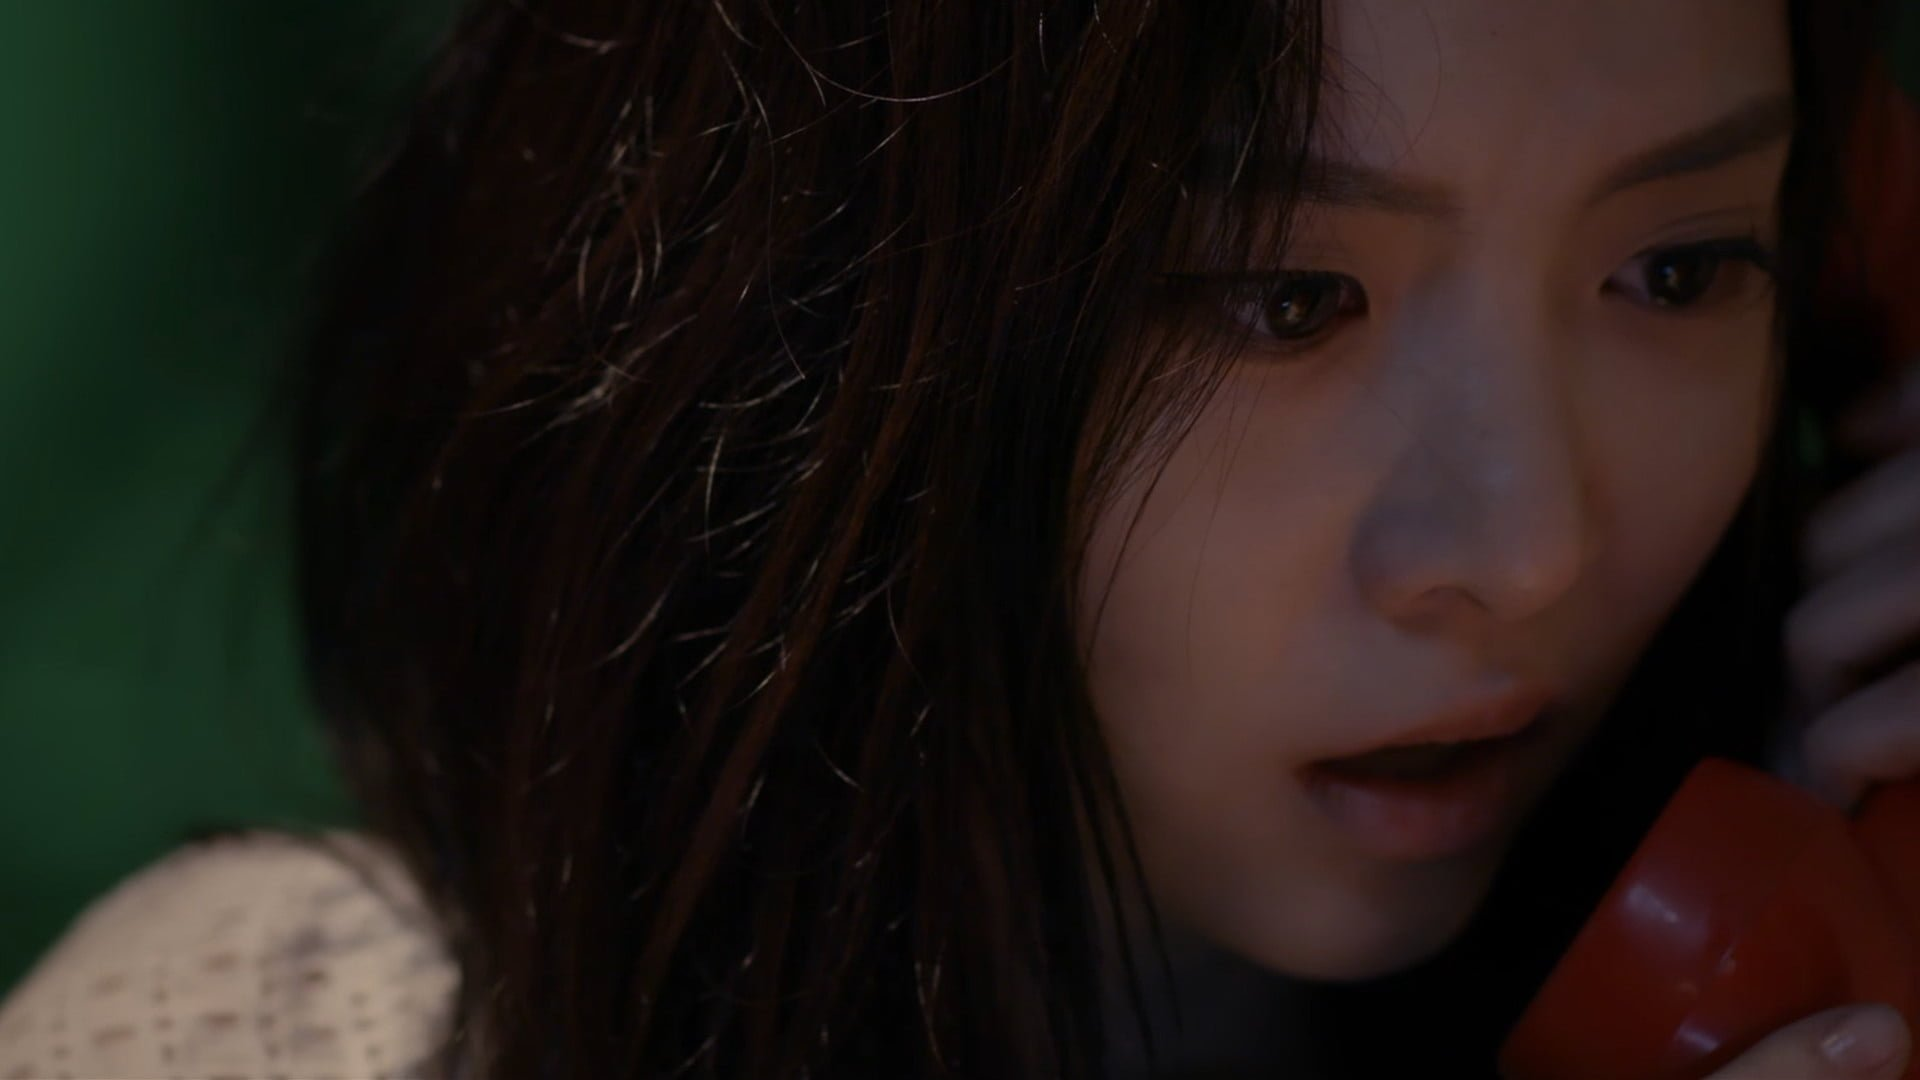 download-MADE-Interactive-Movie-01-Run-away-hadoan-tv-1